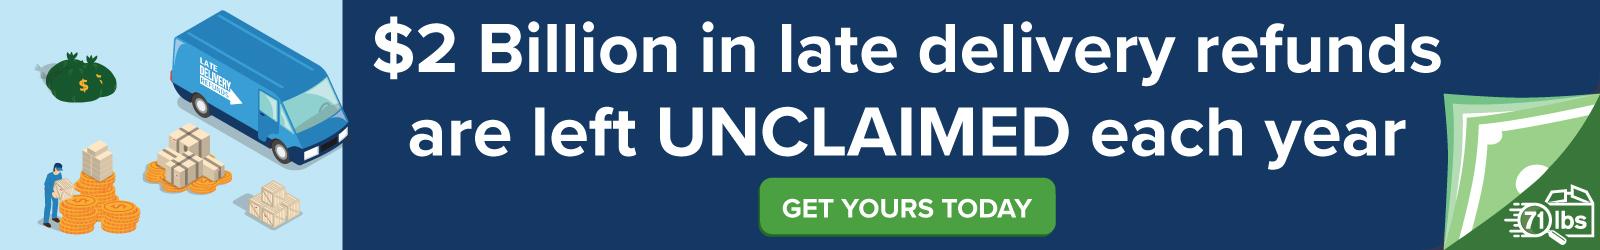 71lbs NumberCruncher Order Time Blog Banner